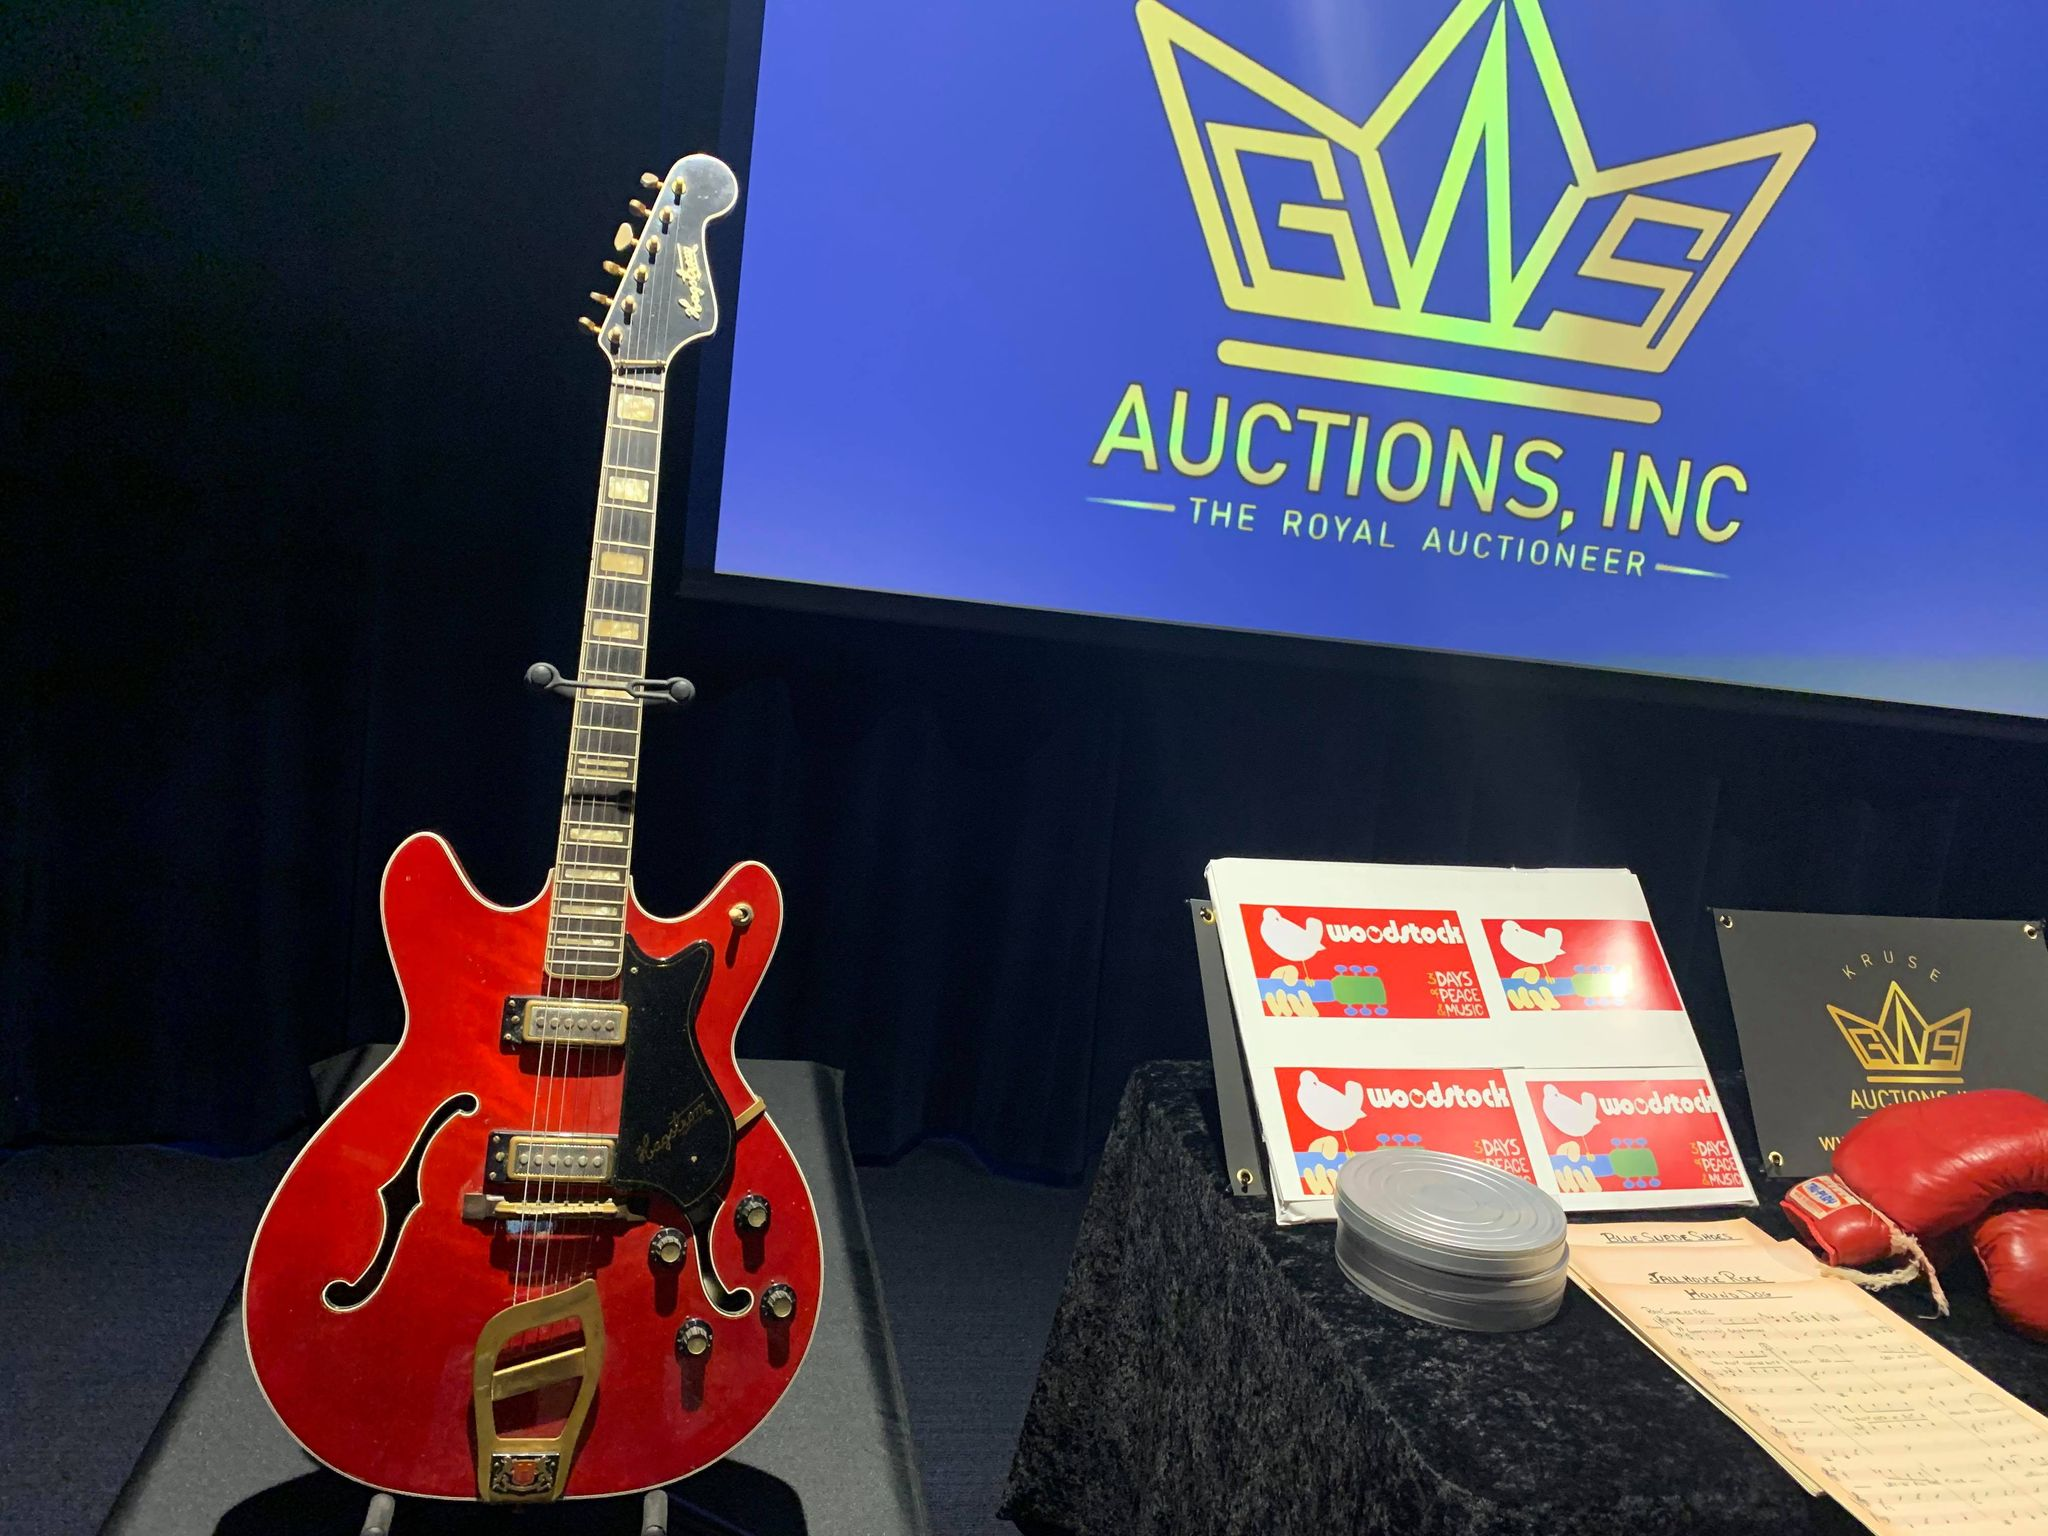 Kruse GWS AuctionsKruse GWS Auctions: Elvis Presley Comeback TV Special guitar